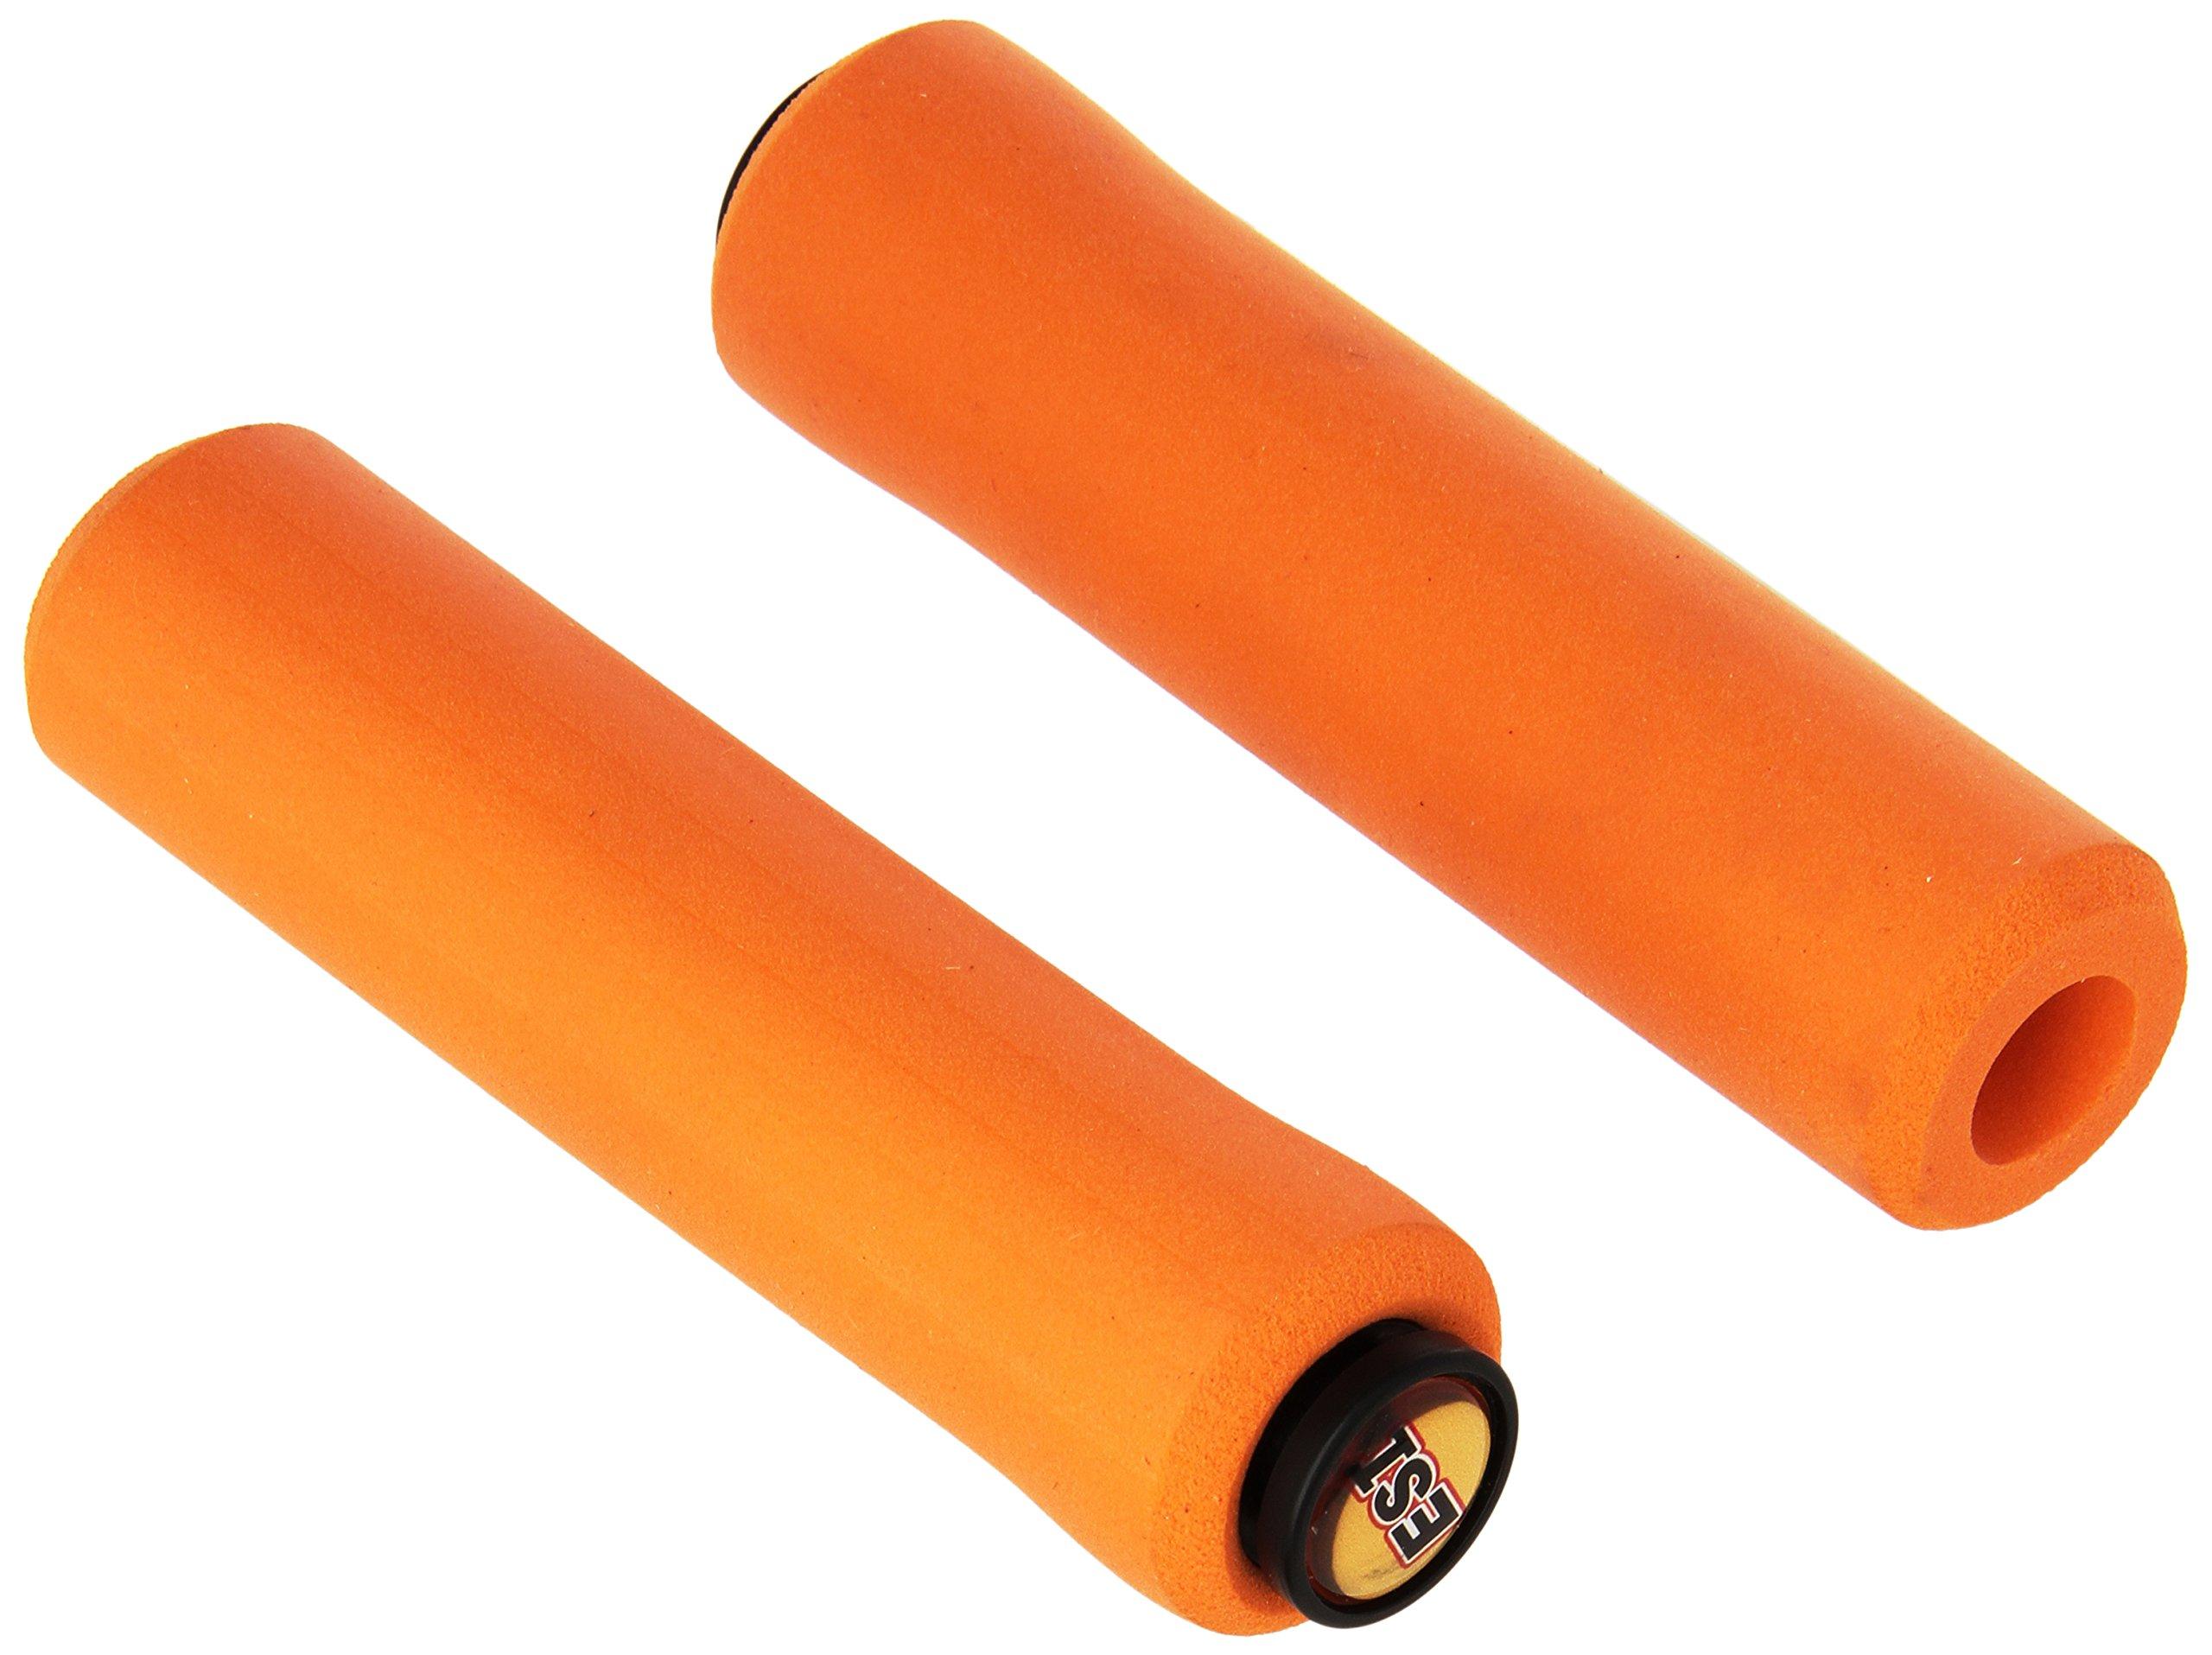 ESI Grips Extra Chunky MTB Grip, Orange by ESI Grips